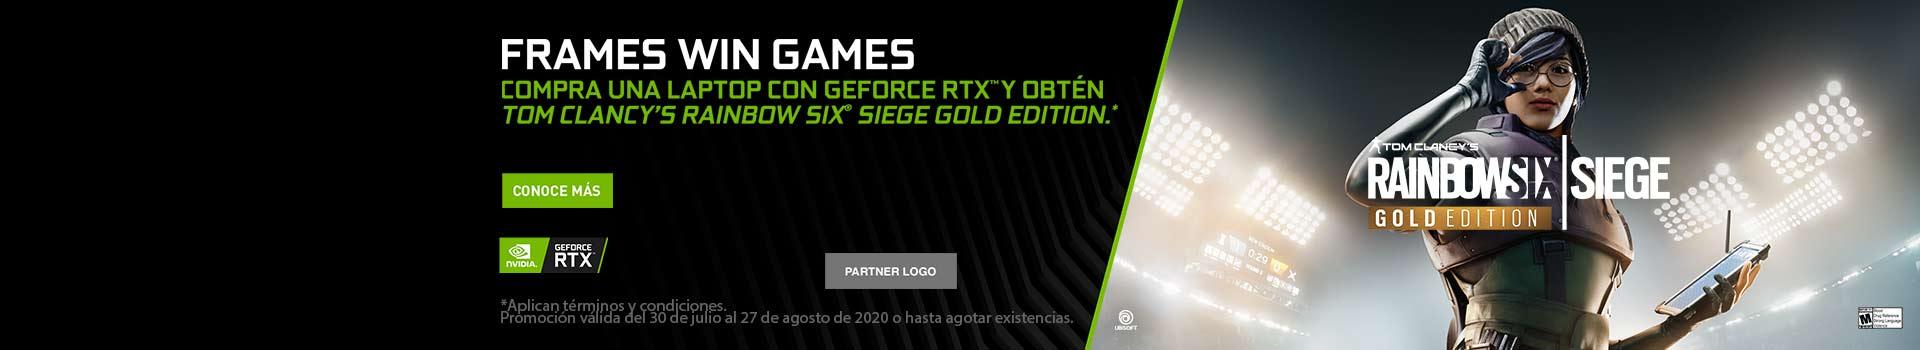 ak-kt-nvidia-gamer-exp-grafica-rtx-03-agosto-2020